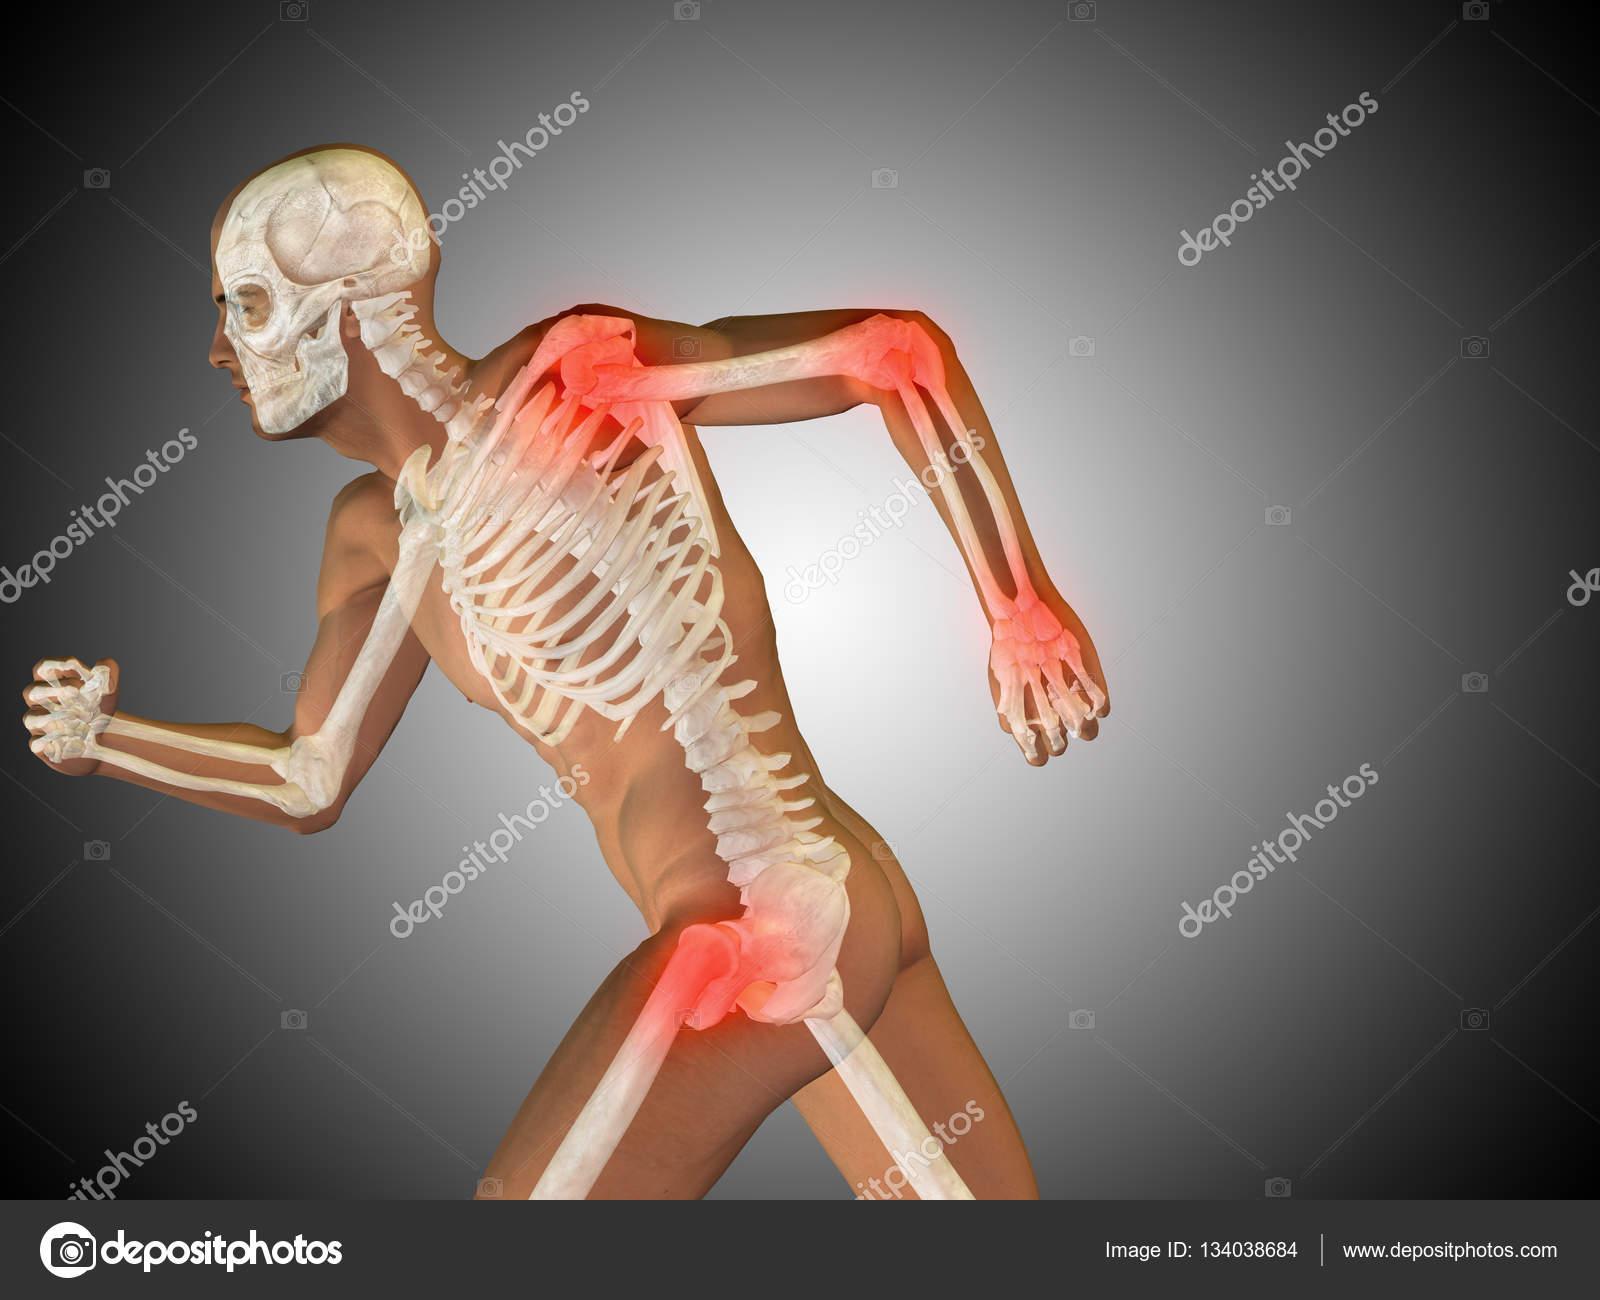 anatomía humana sobre fondo gris — Foto de stock © design36 #134038684